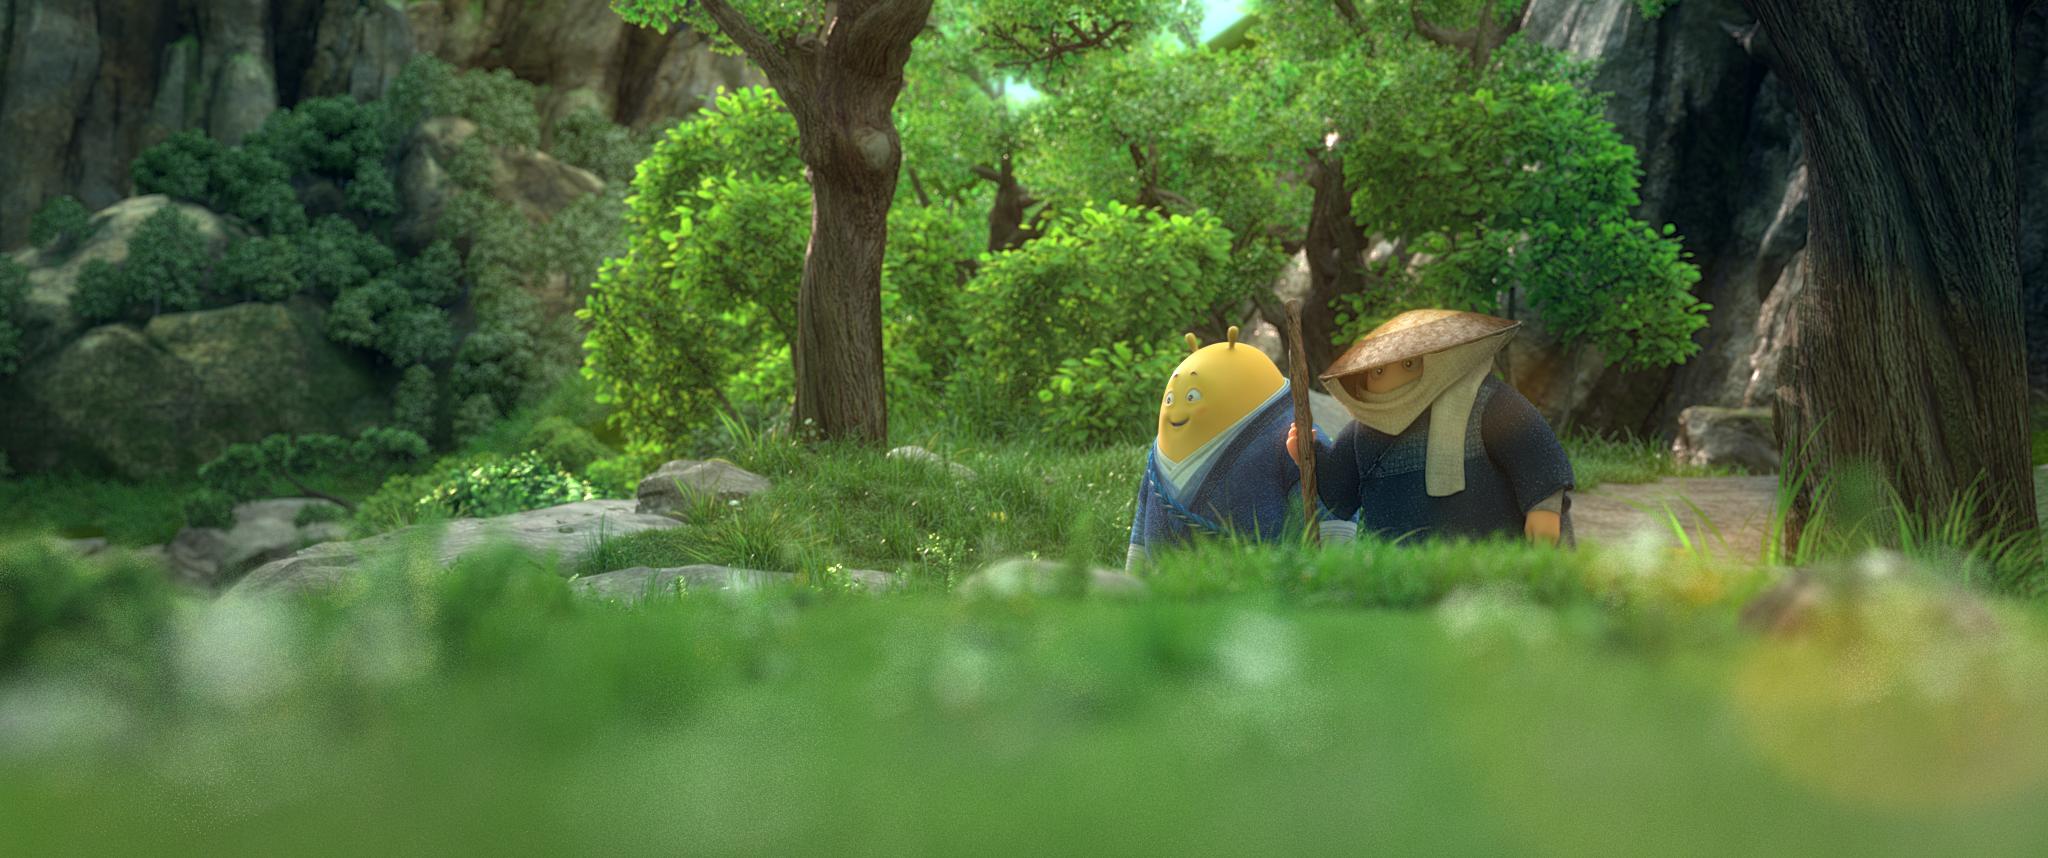 Кадр из фильма «Кунг-фу воин»